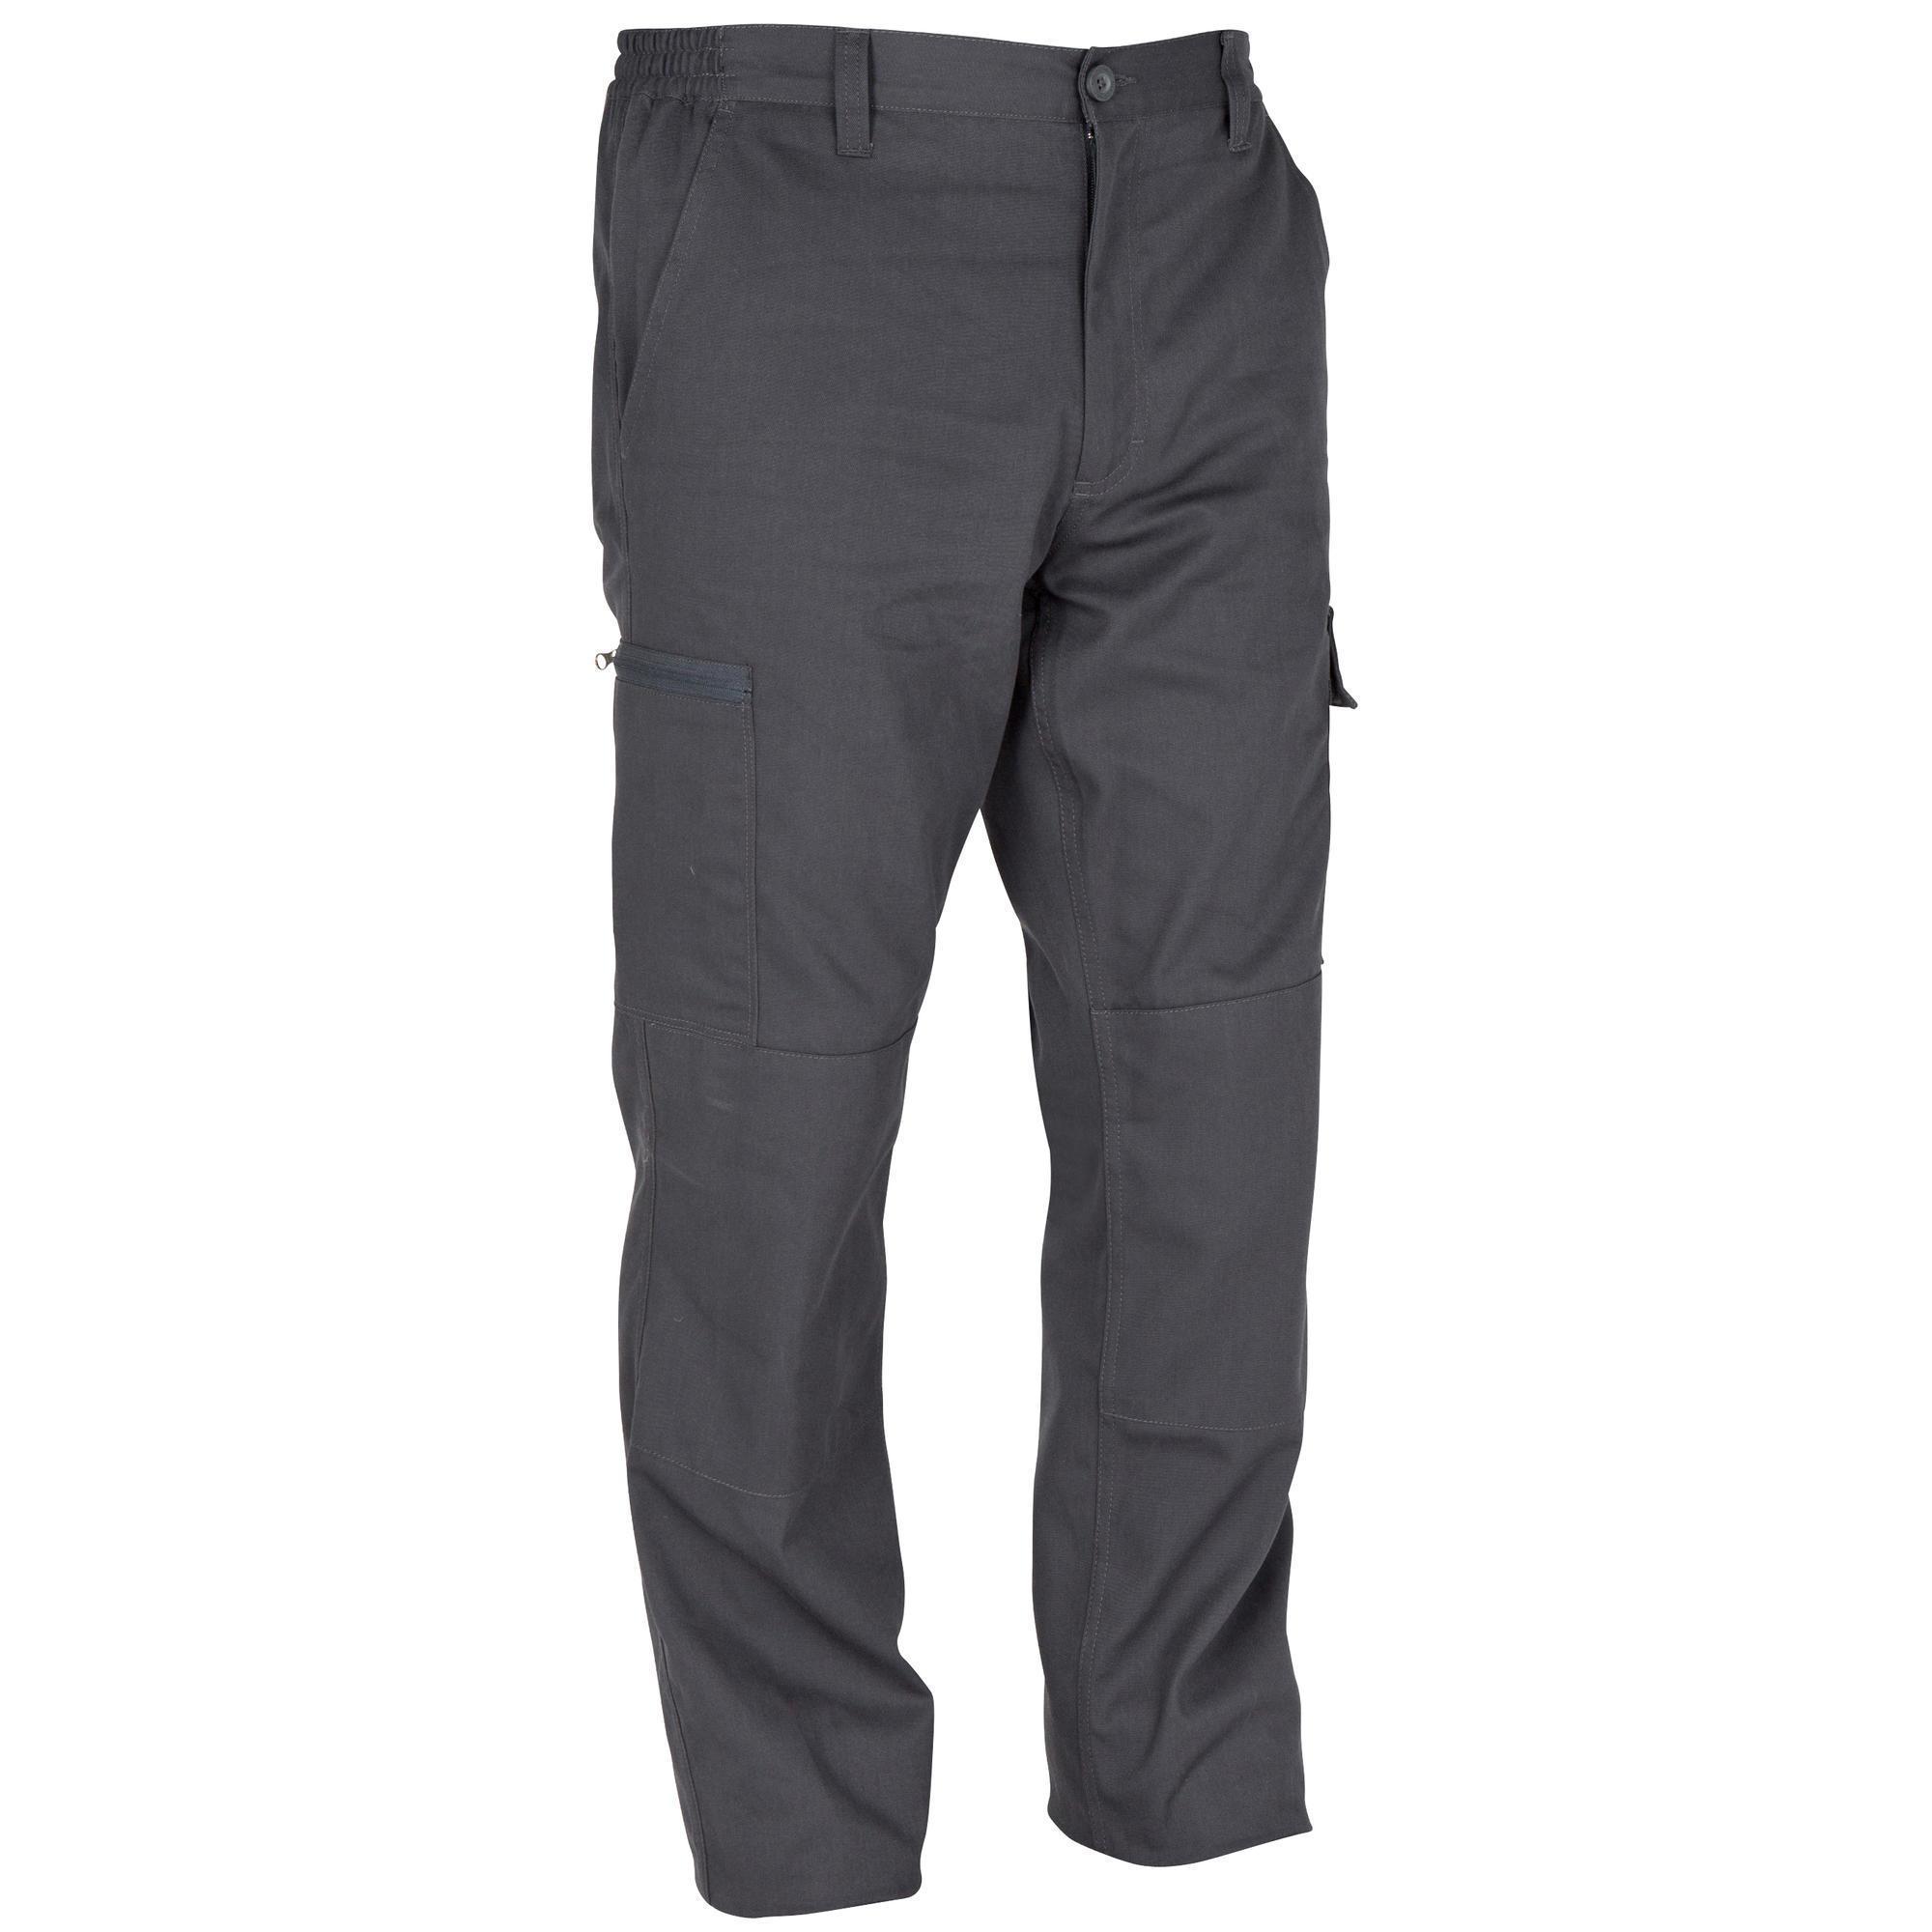 f3cf8484fd6 Comprar Pantalones Deportivos para Hombre